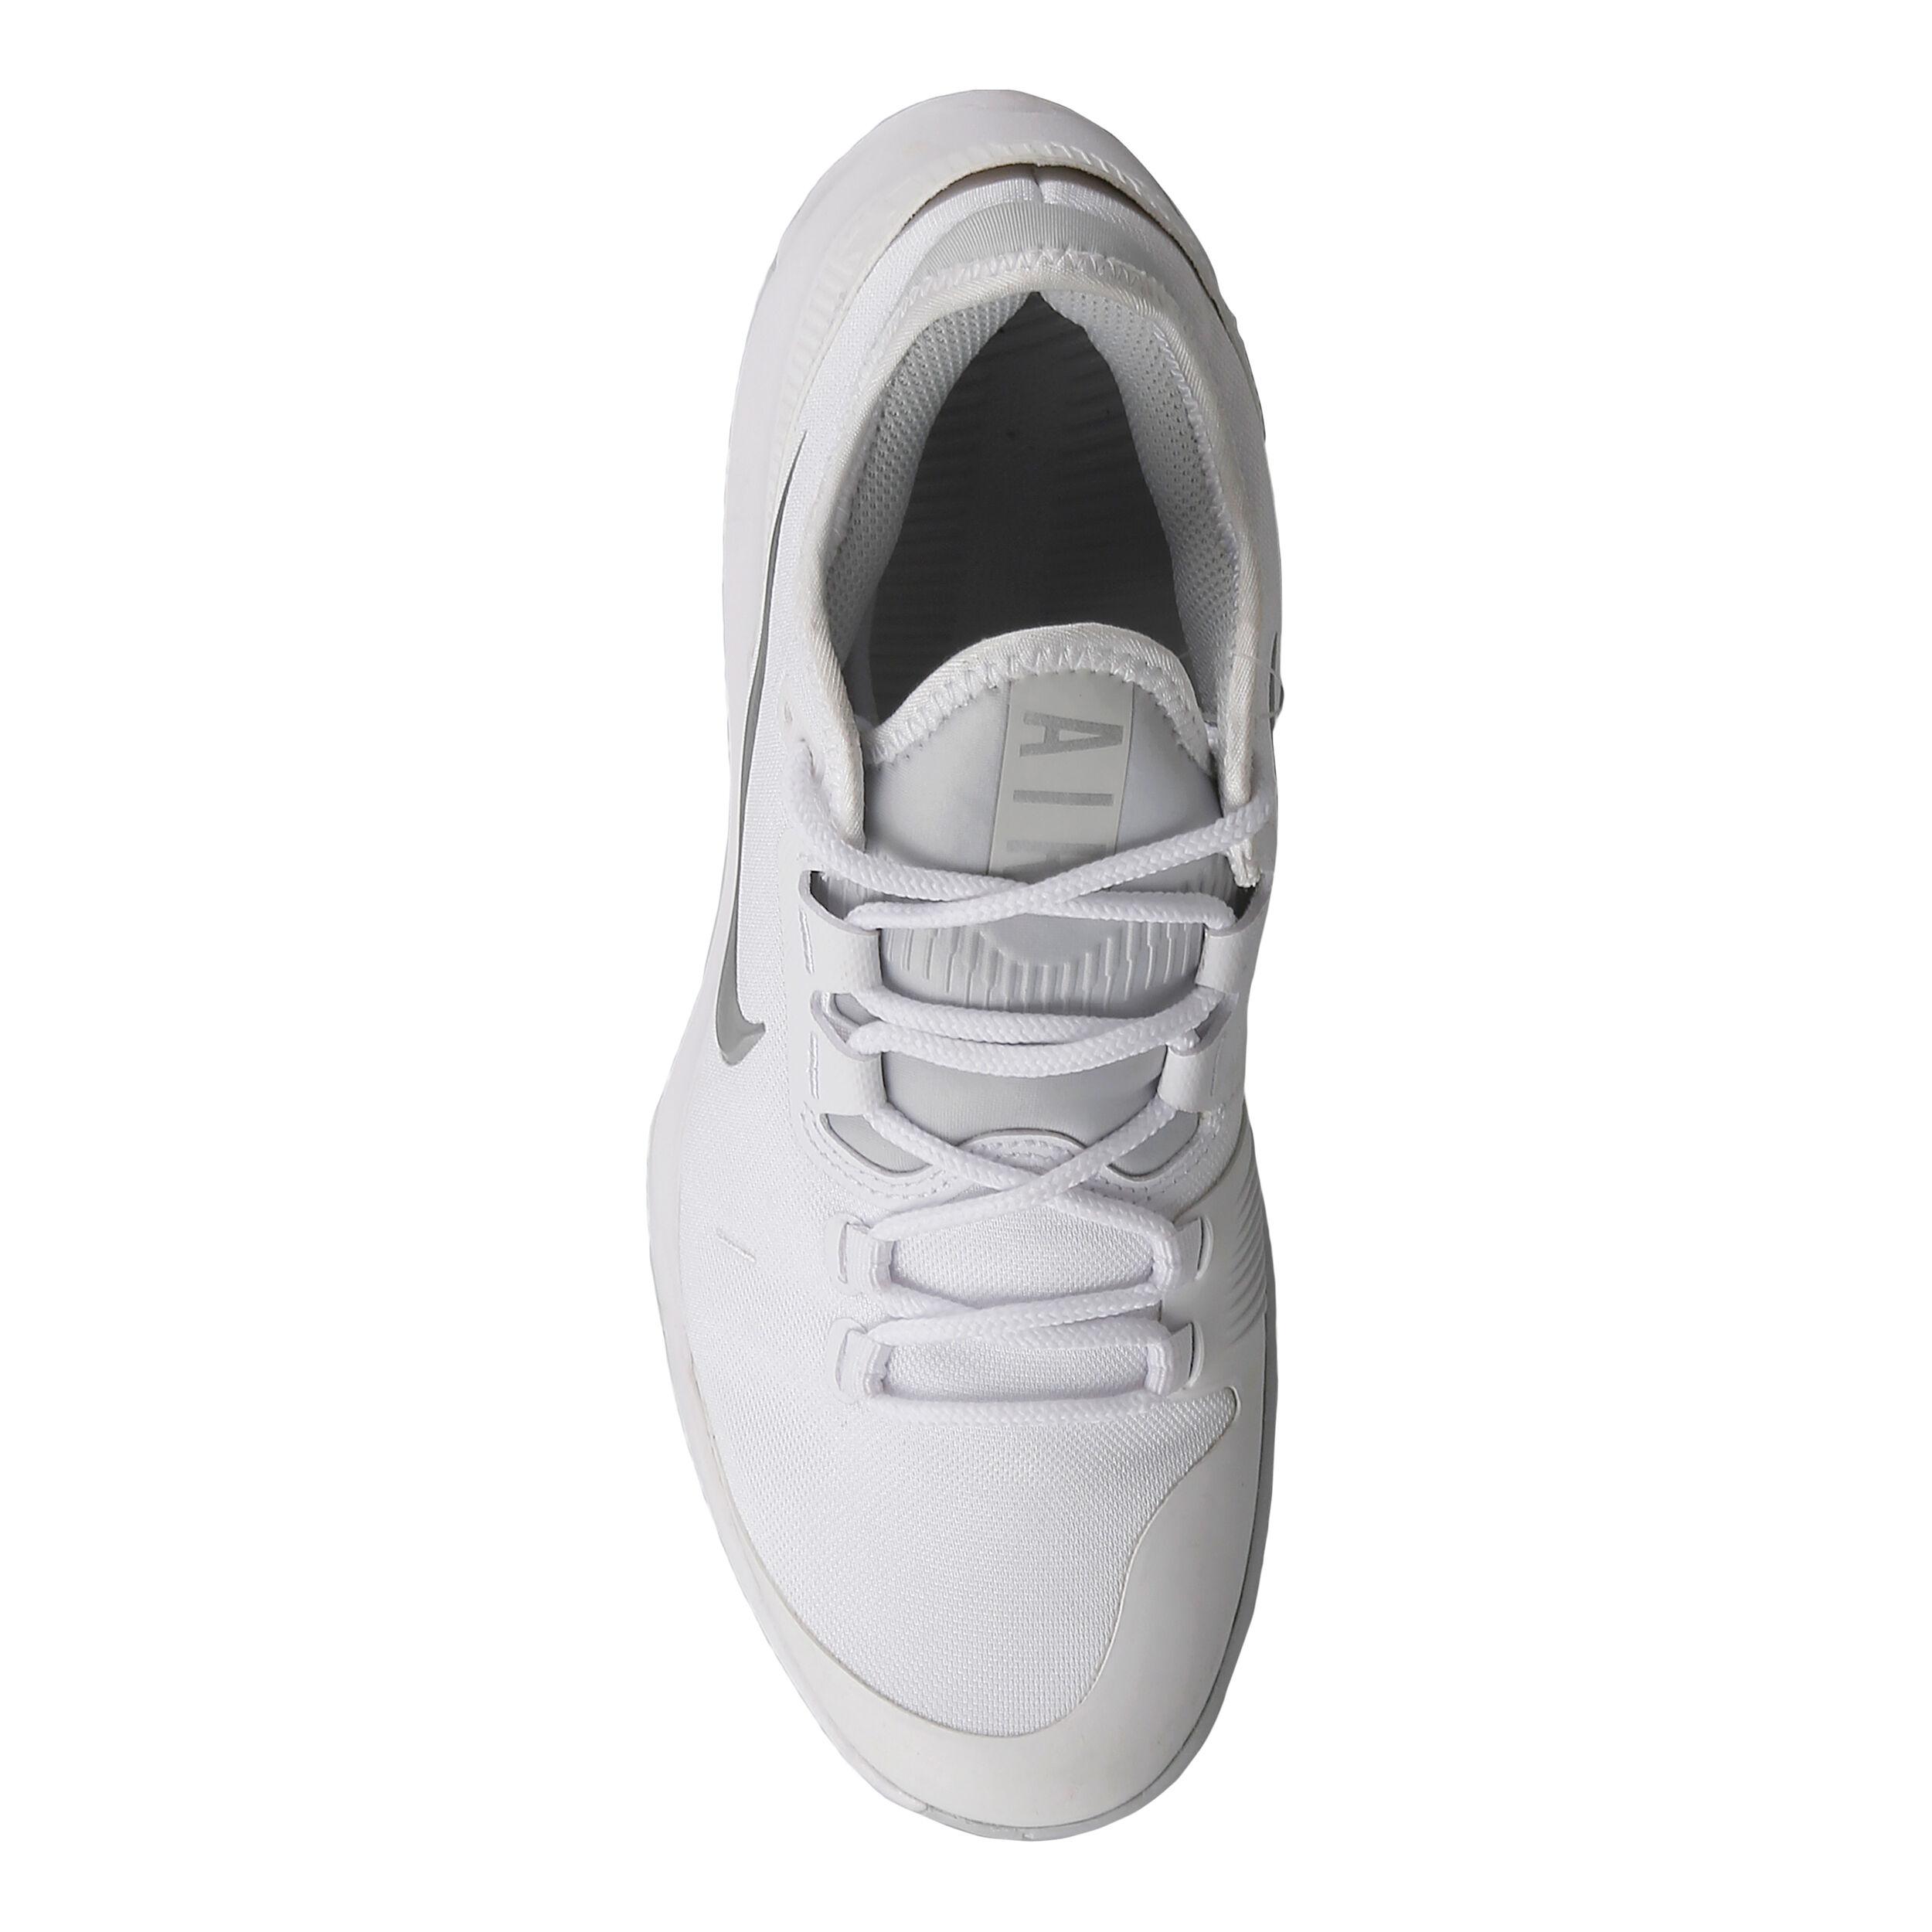 Nike Air Max Wildcard Allcourtschuh Damen Weiß, Silber